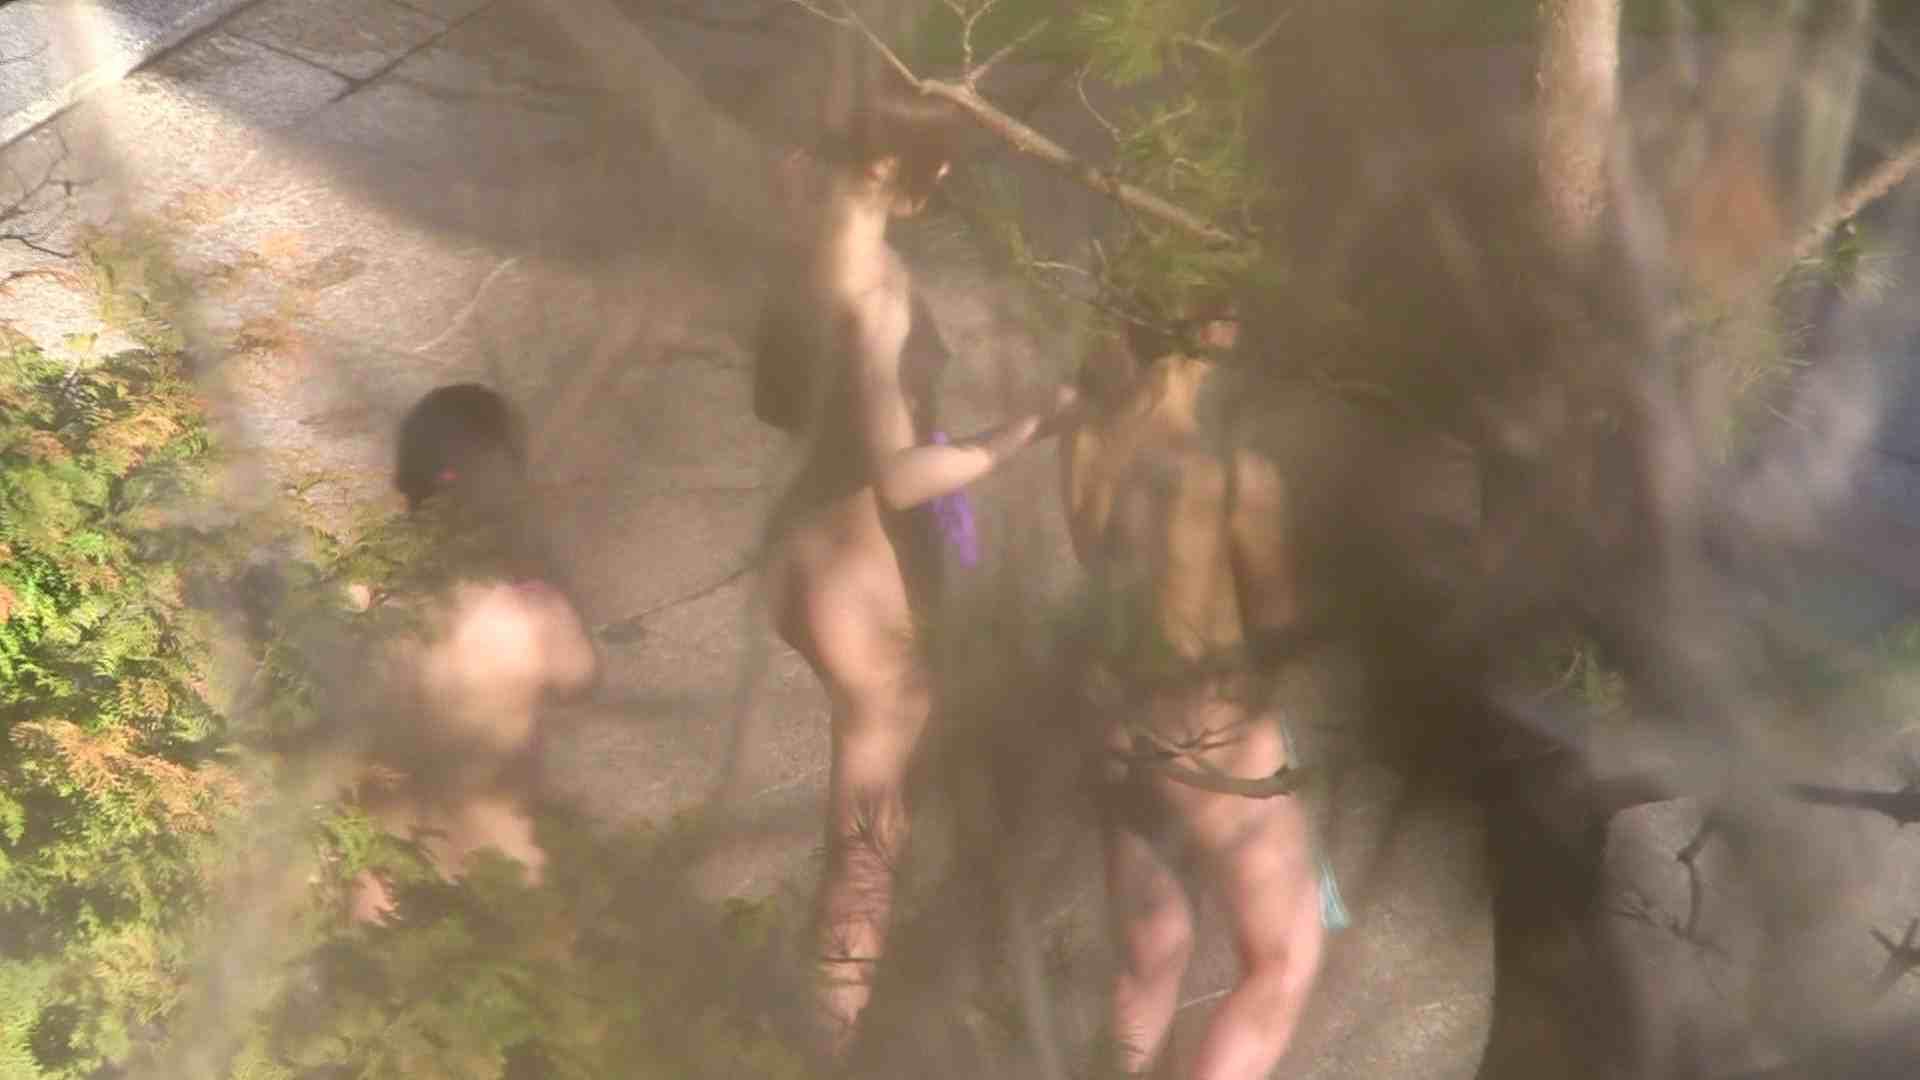 Aquaな露天風呂Vol.698 美しいOLの裸体 われめAV動画紹介 104pic 11